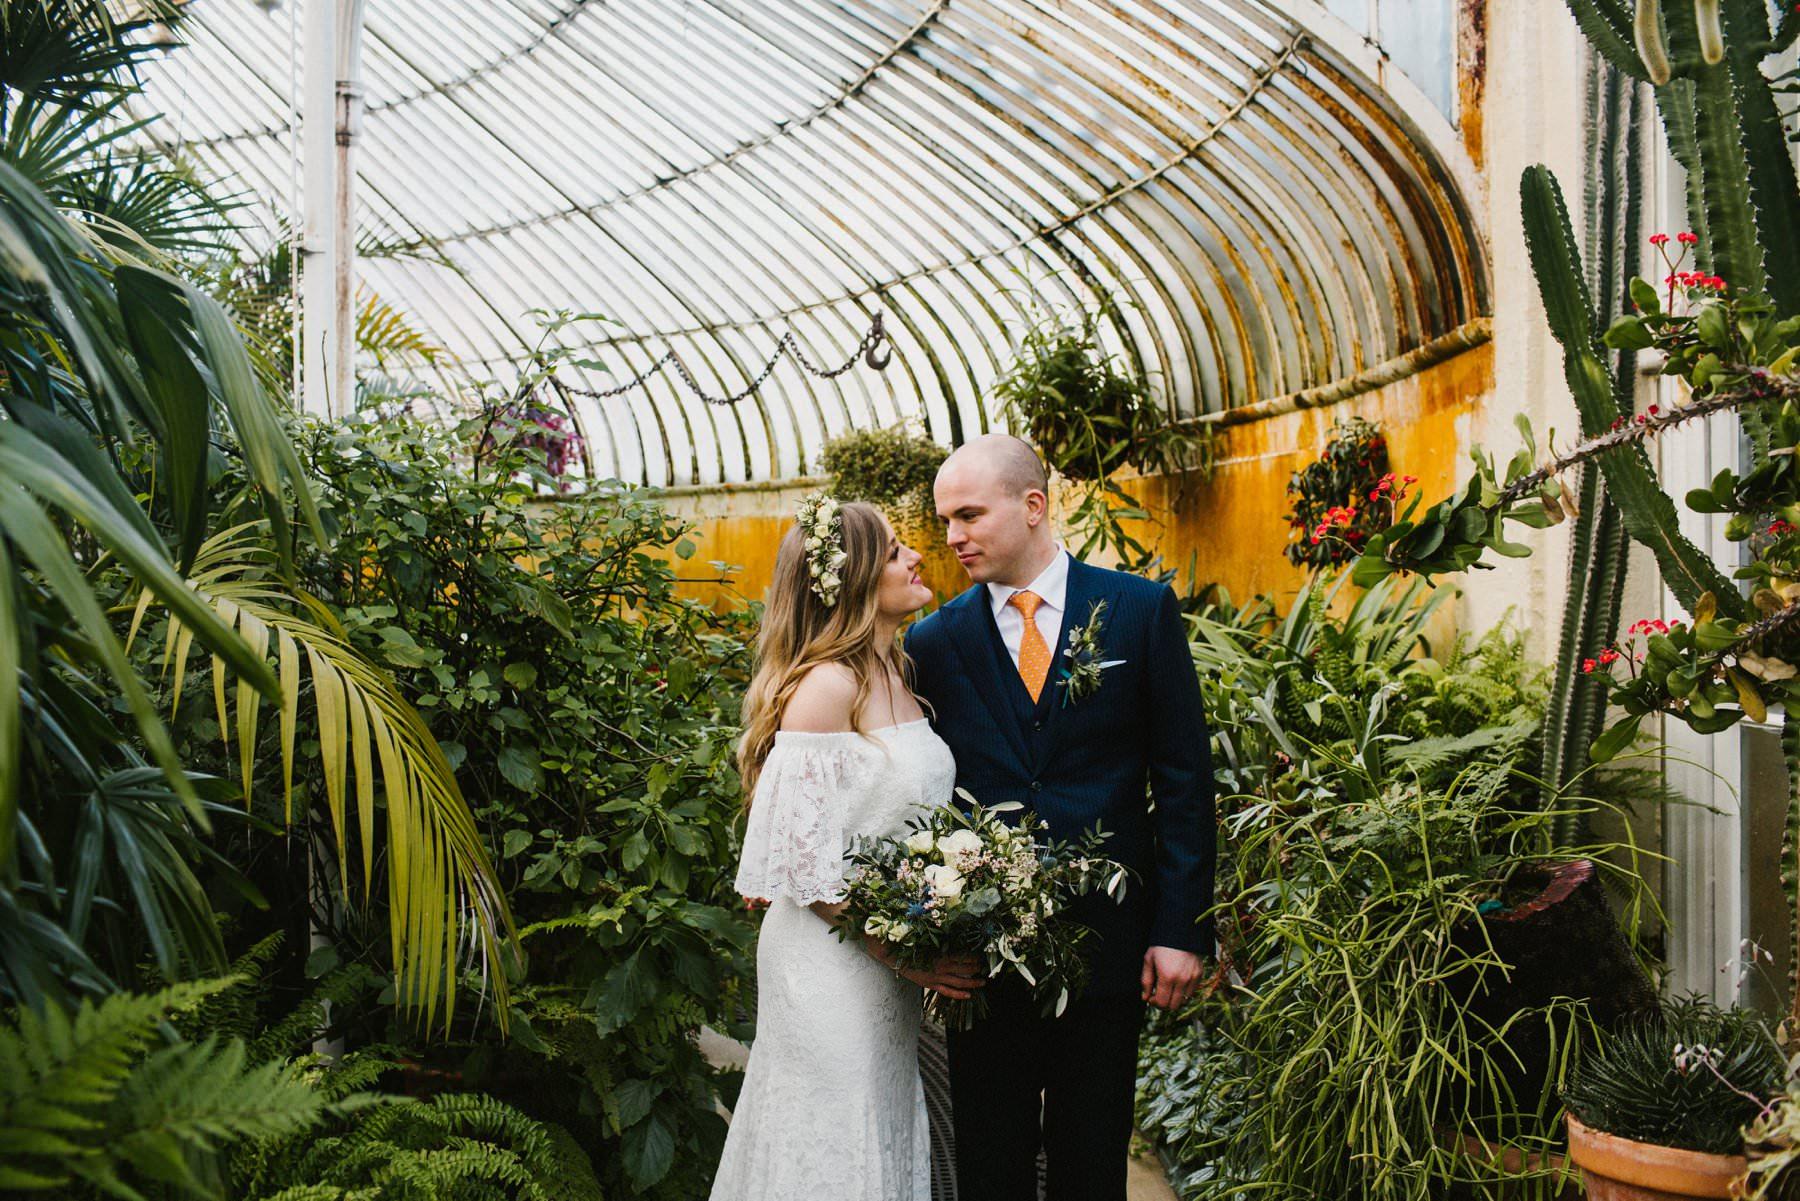 wedding photography at botanic gardens belfast northern ireland